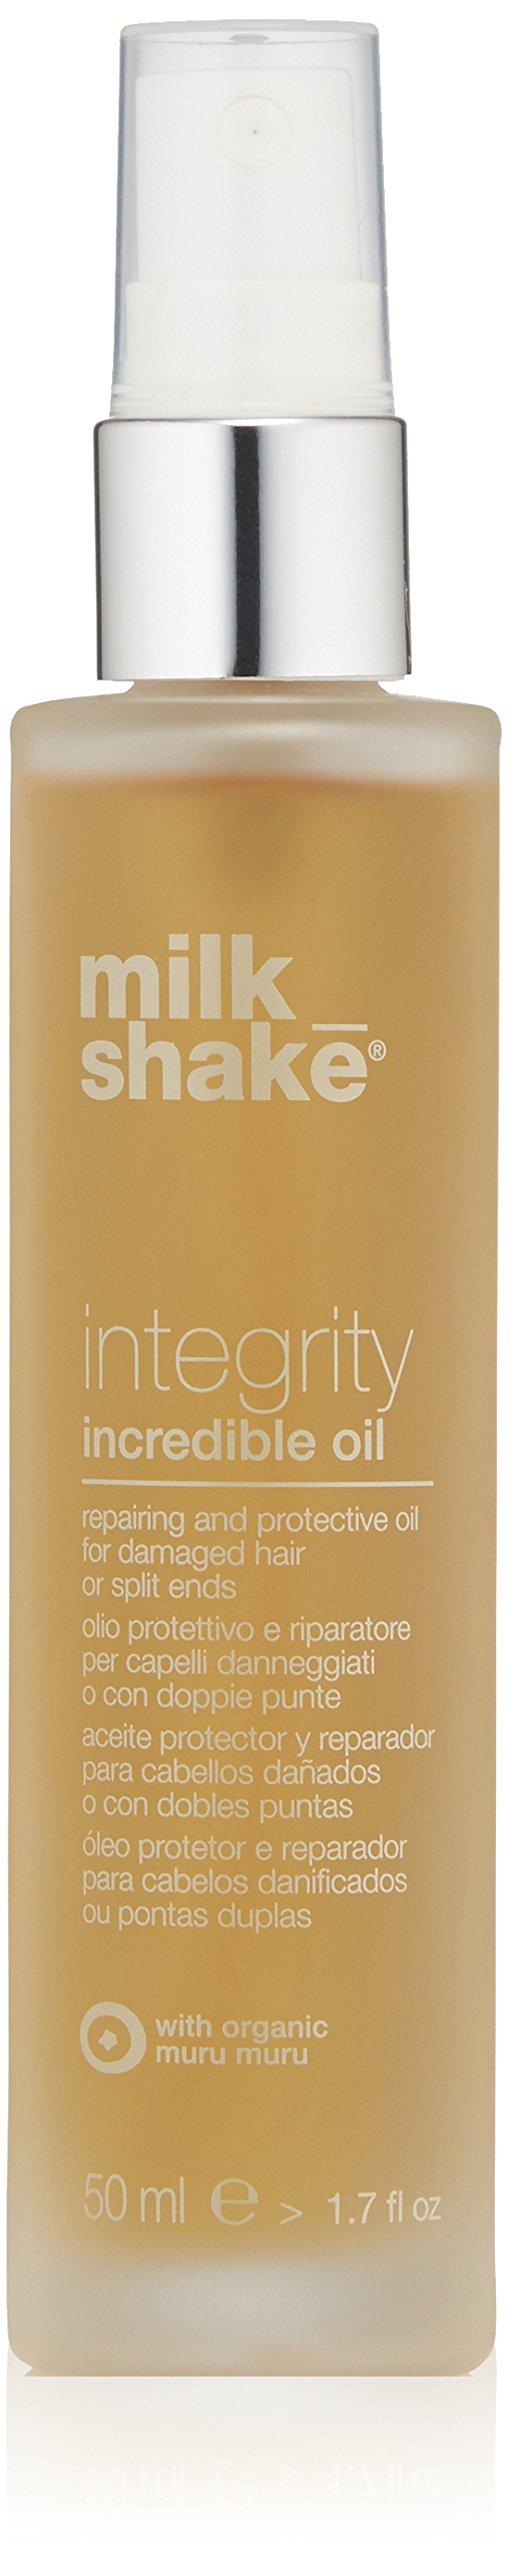 milk_shake Integrity Incredible Oil, 1.7 Fl Oz